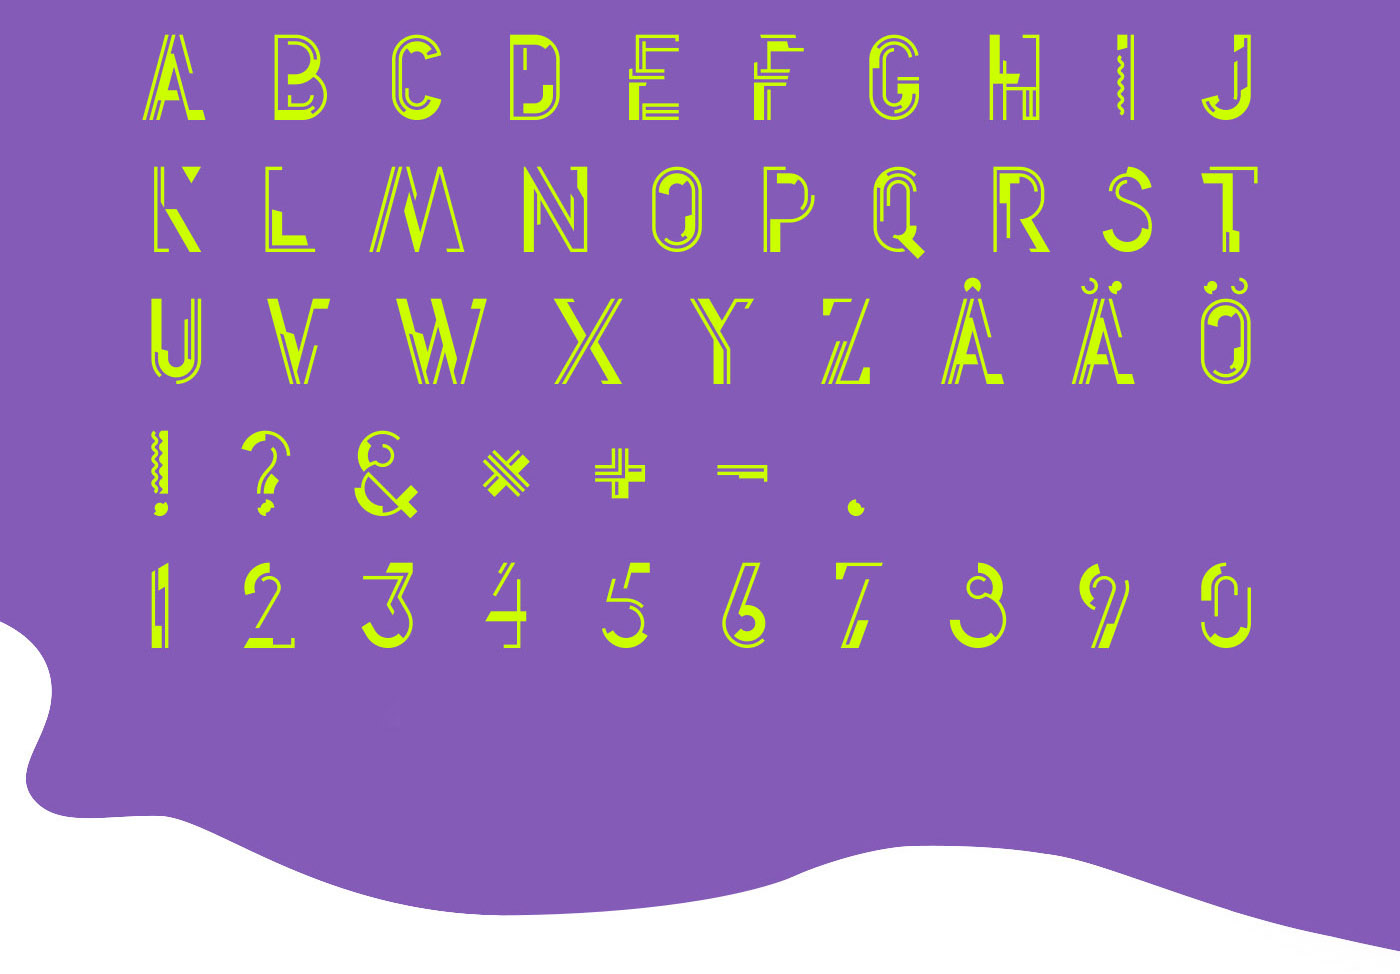 modern futuristic minimalistic Space  font Typeface mars nasa typography